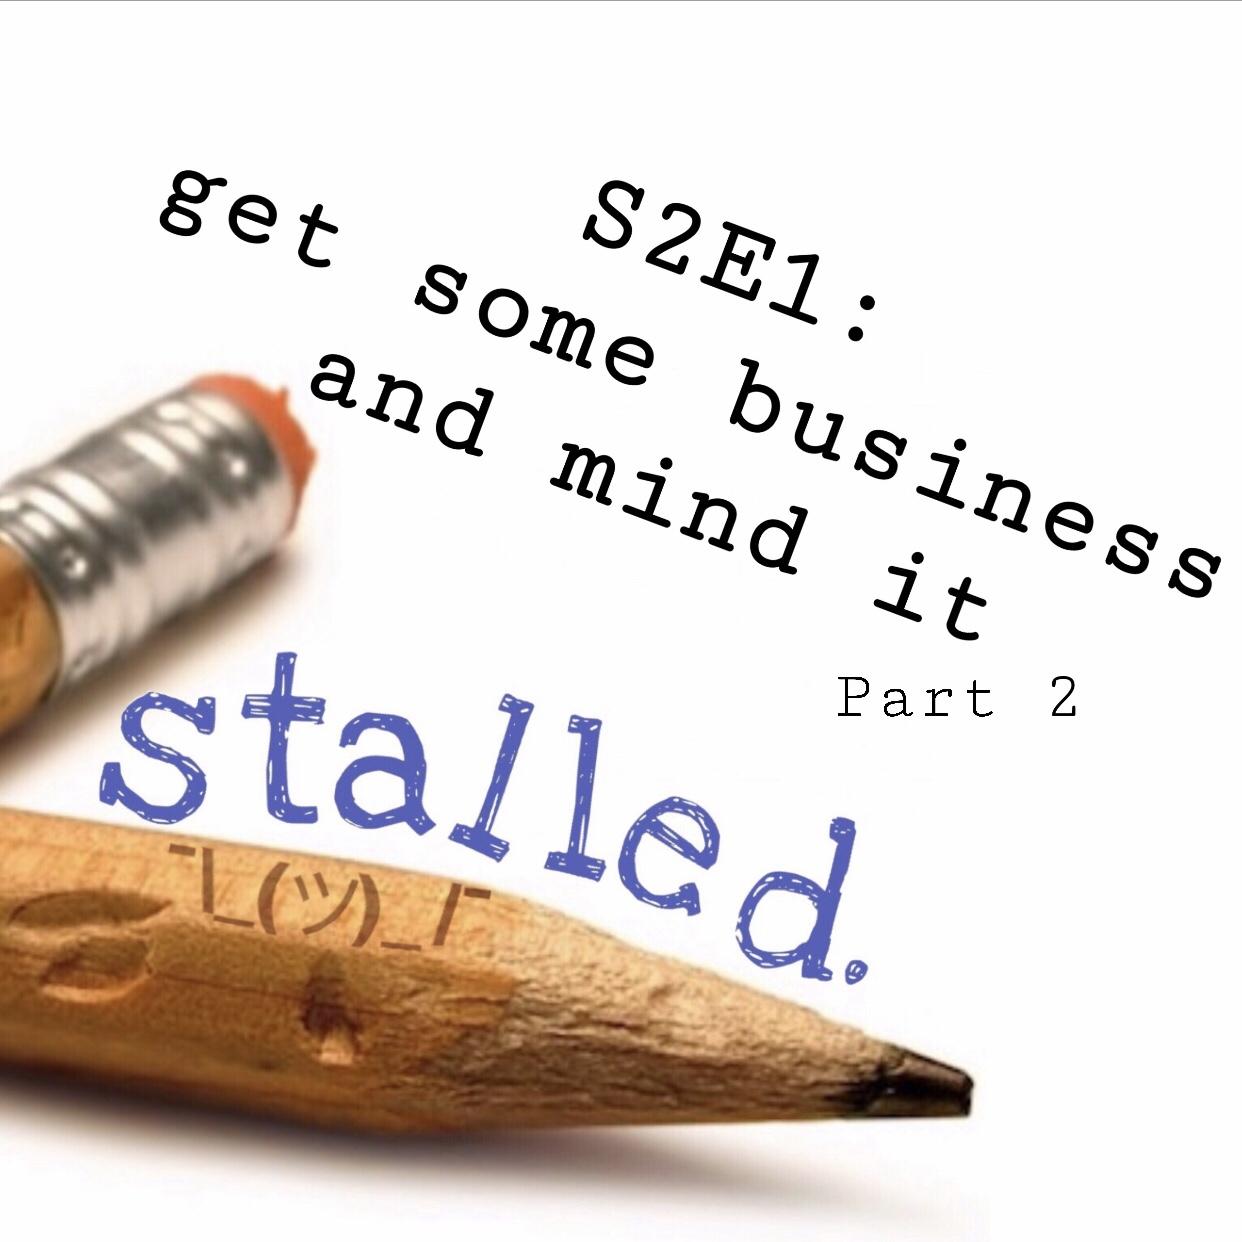 Stalled Podcast Tavinda Media S2E1.2